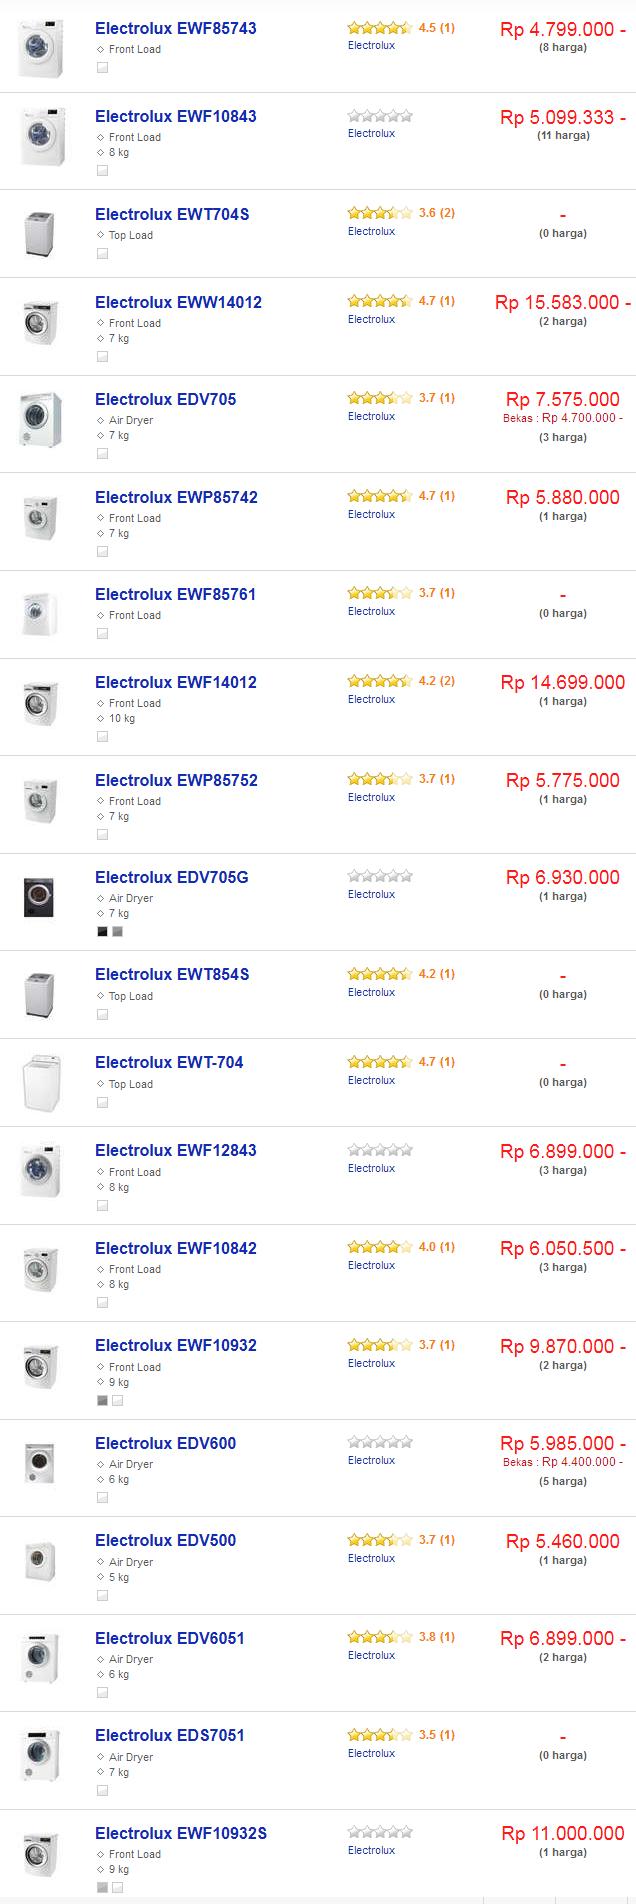 Daftar harga mesin cuci electrolux terbaru